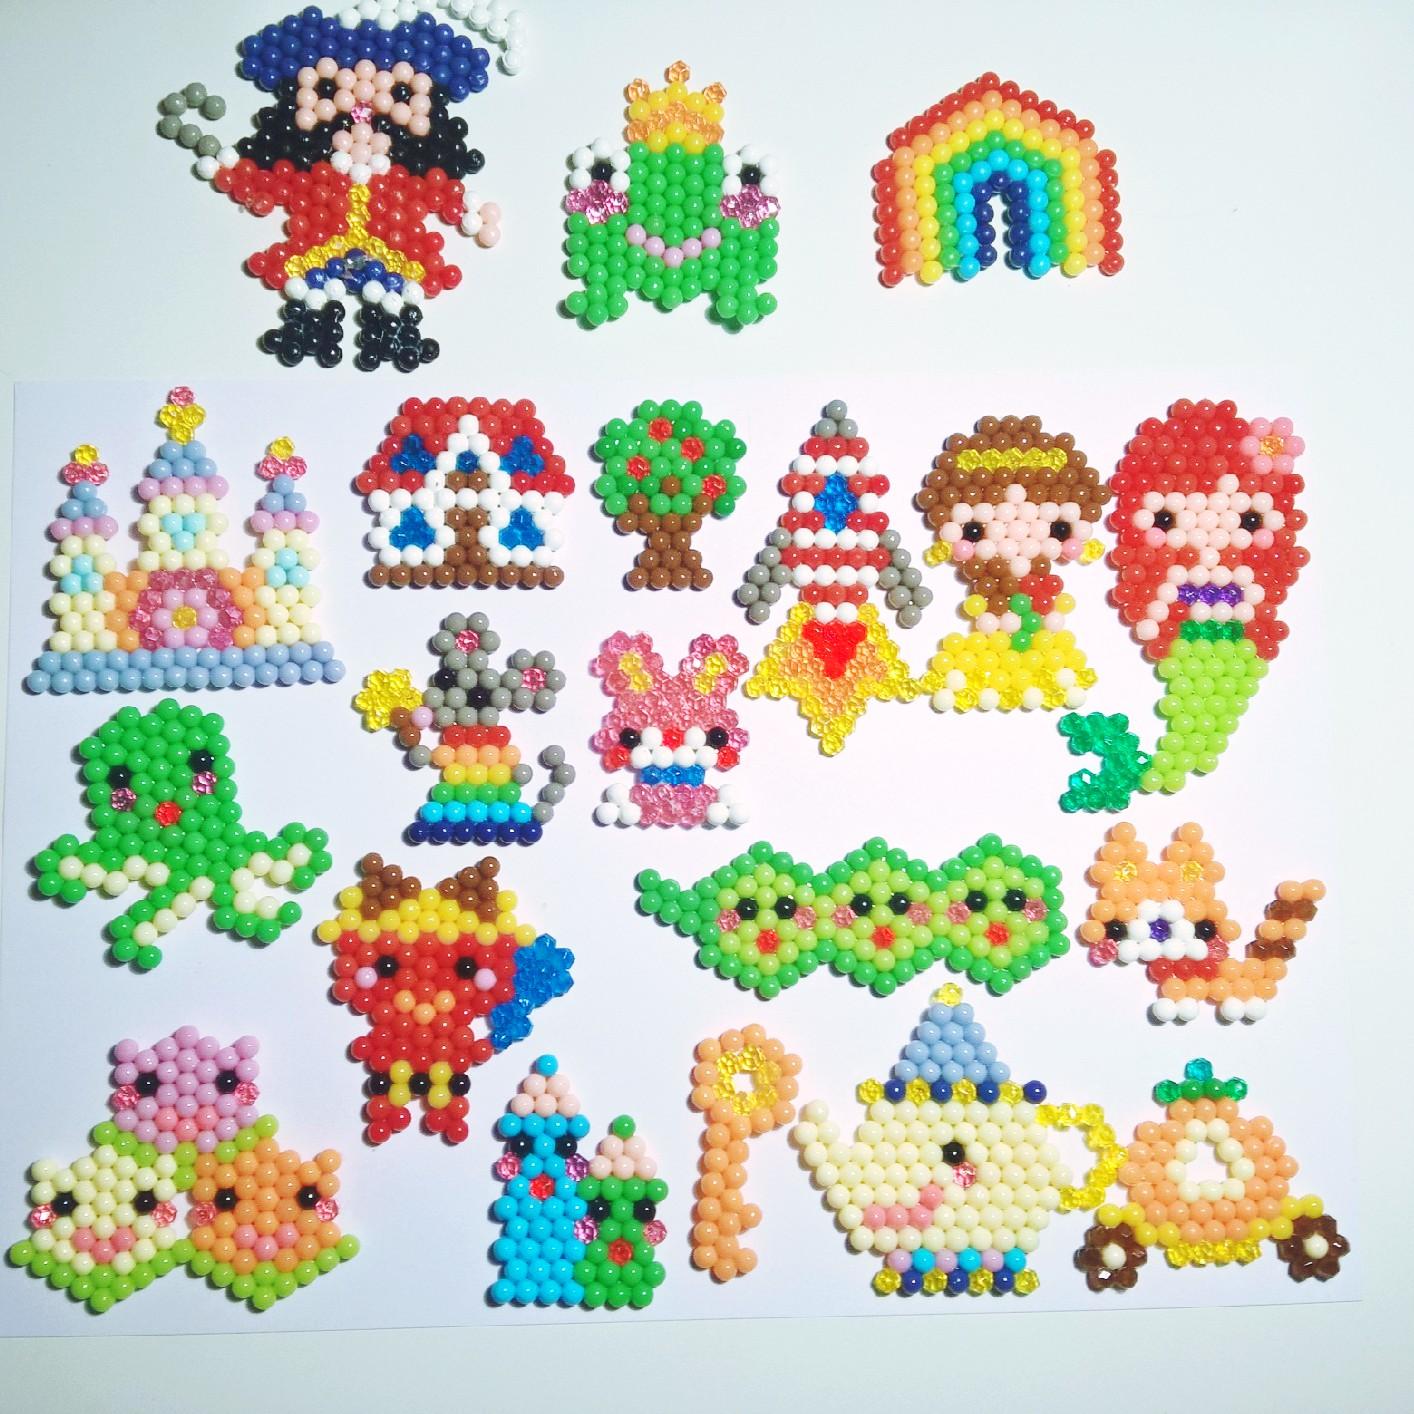 Aquabeads-Disney-Princesse Jeu de caractères